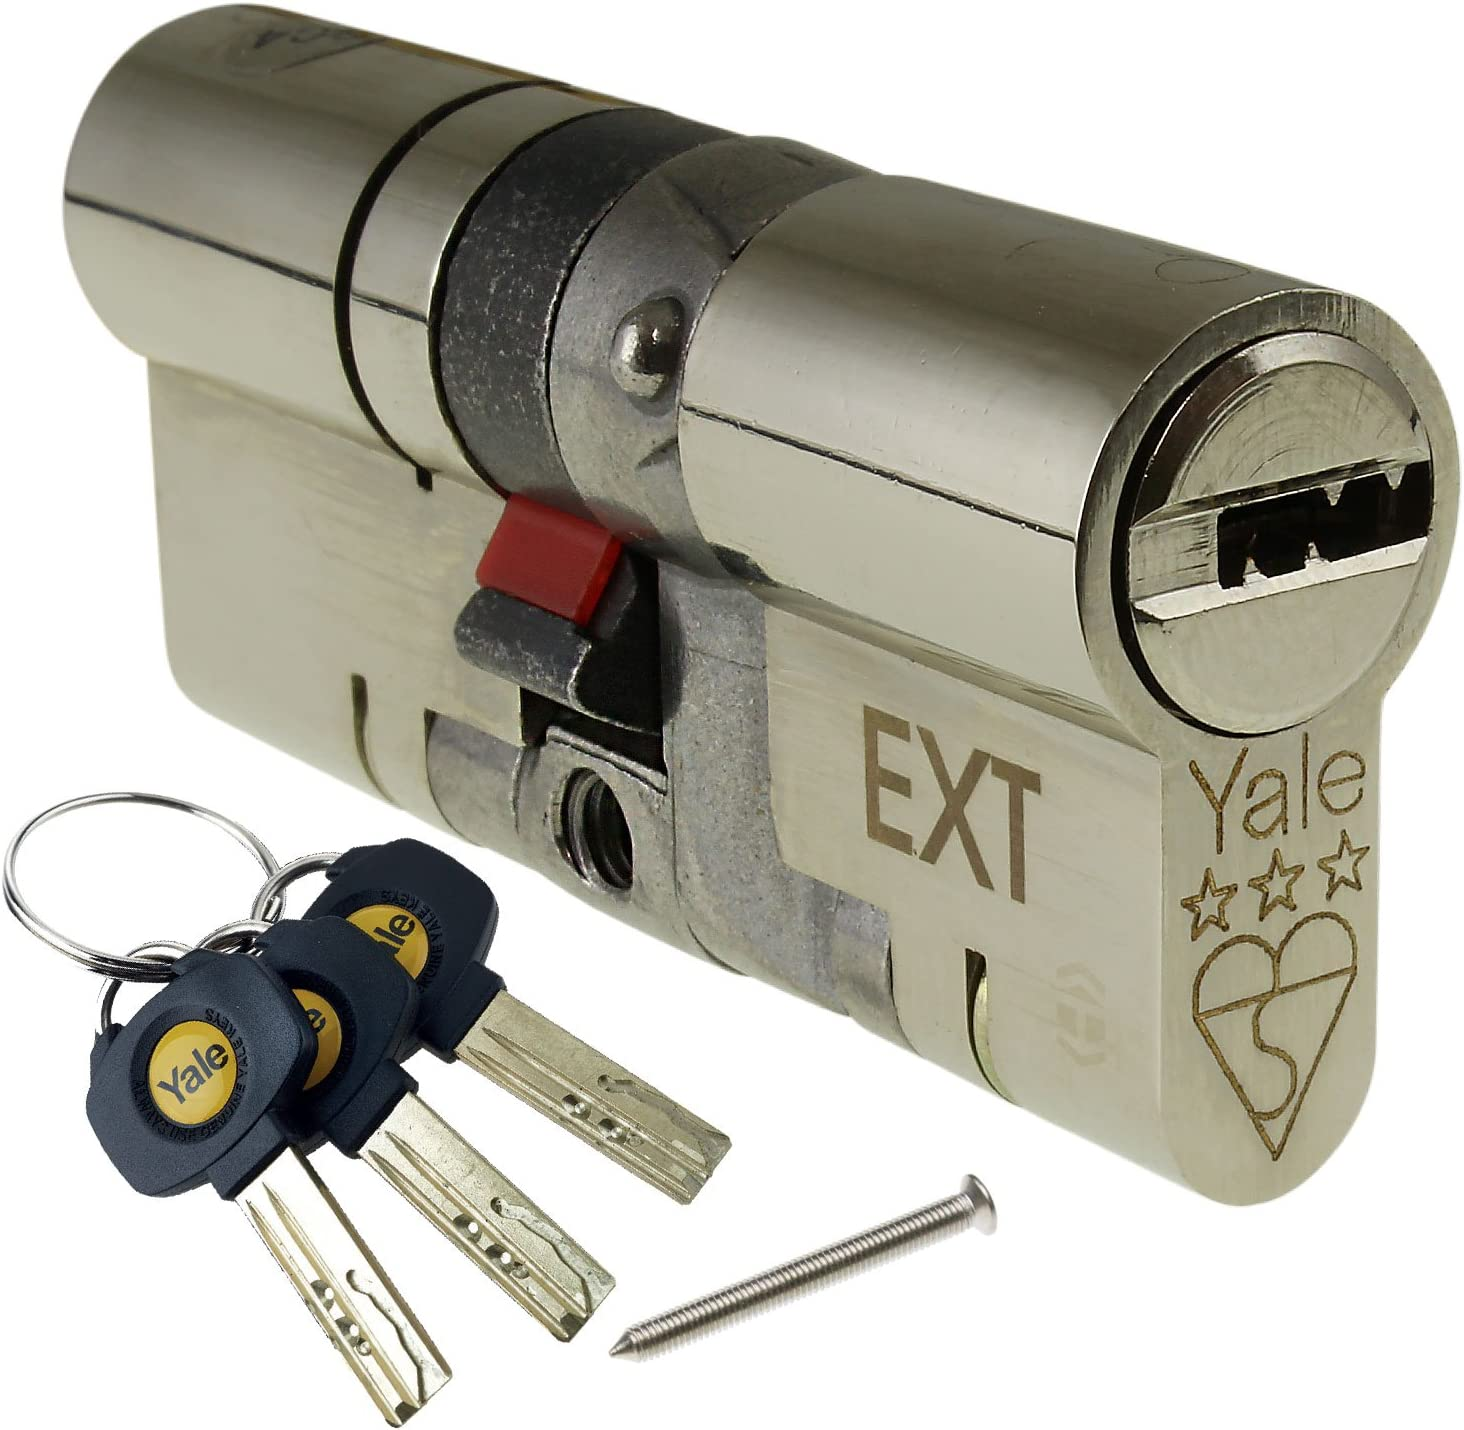 Nickel YALE Platinum 3 Star Euro Cylinder Anti Snap Bump High Security uPVC Door Barrel TS2007:2013 Lock 5 total 95mm 2 Extra Keys 50//45